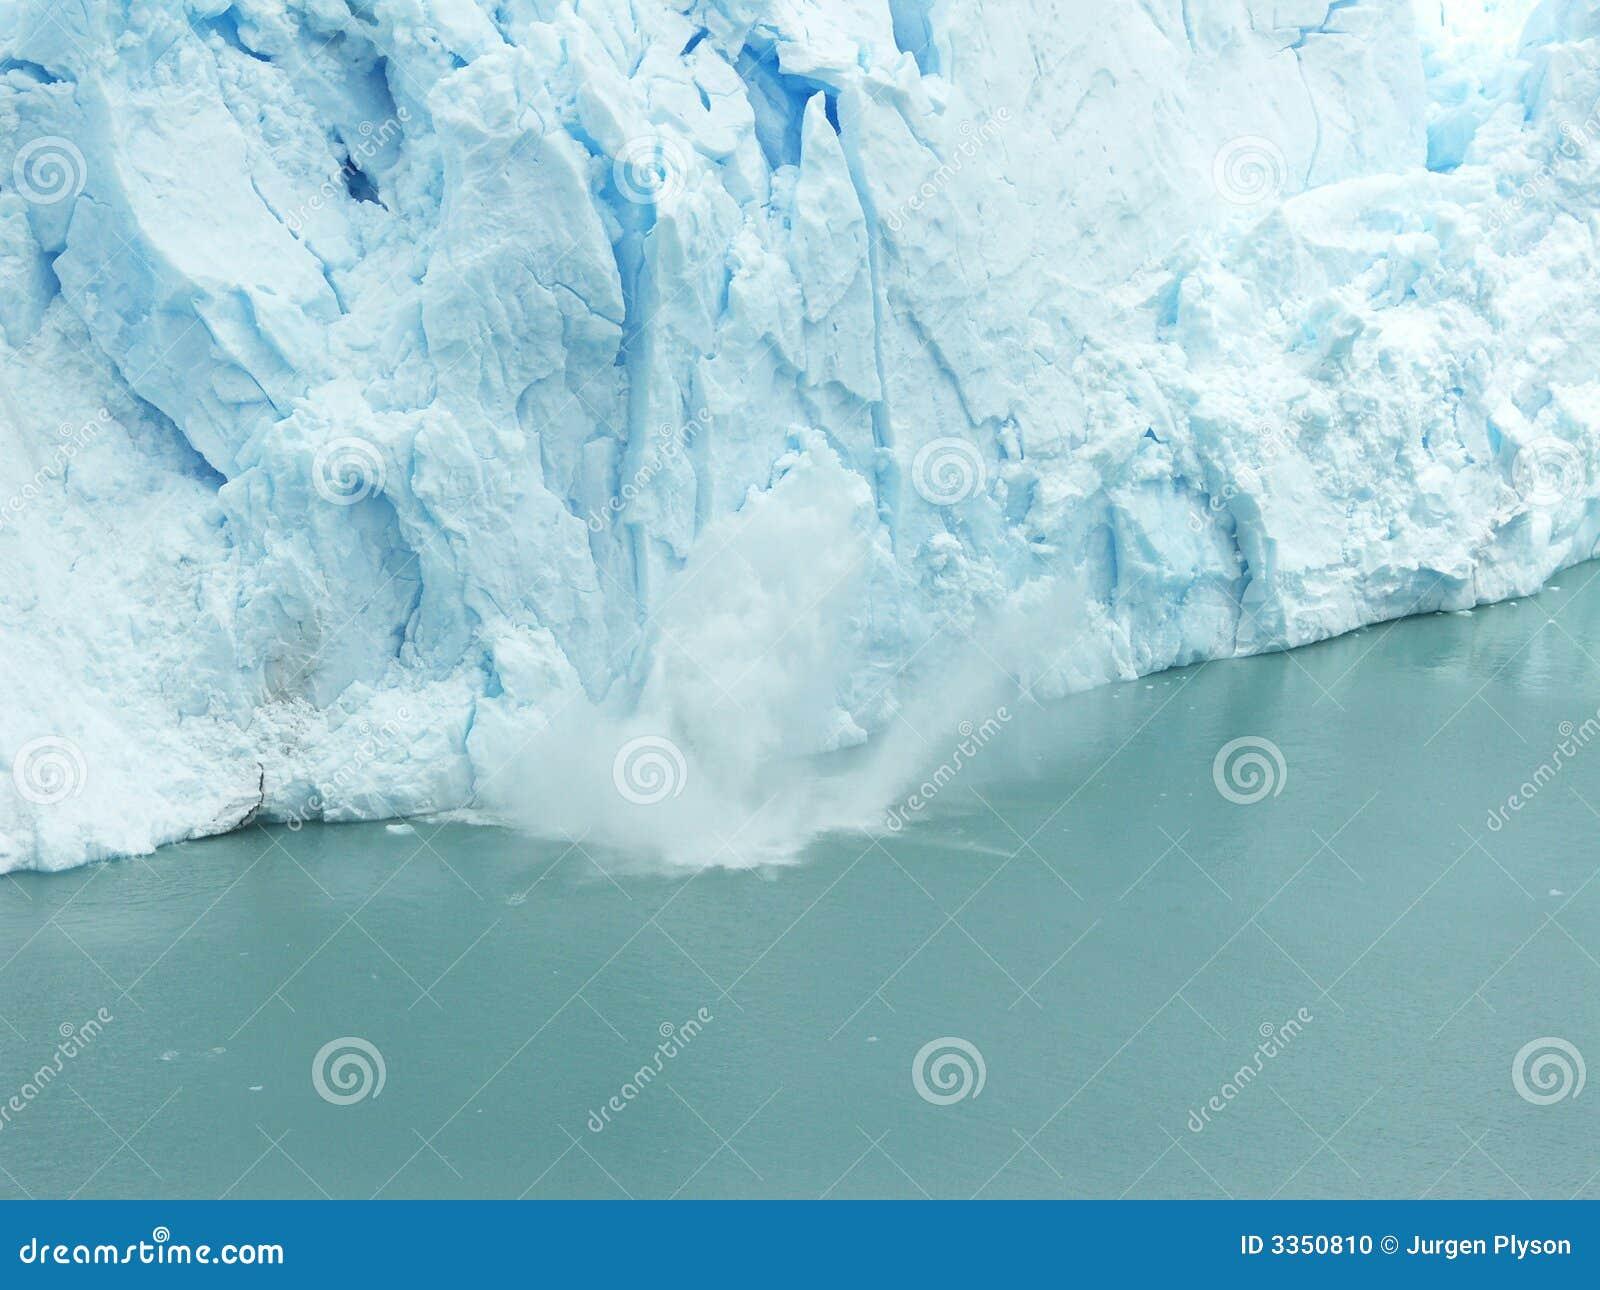 Quebrando o gelo